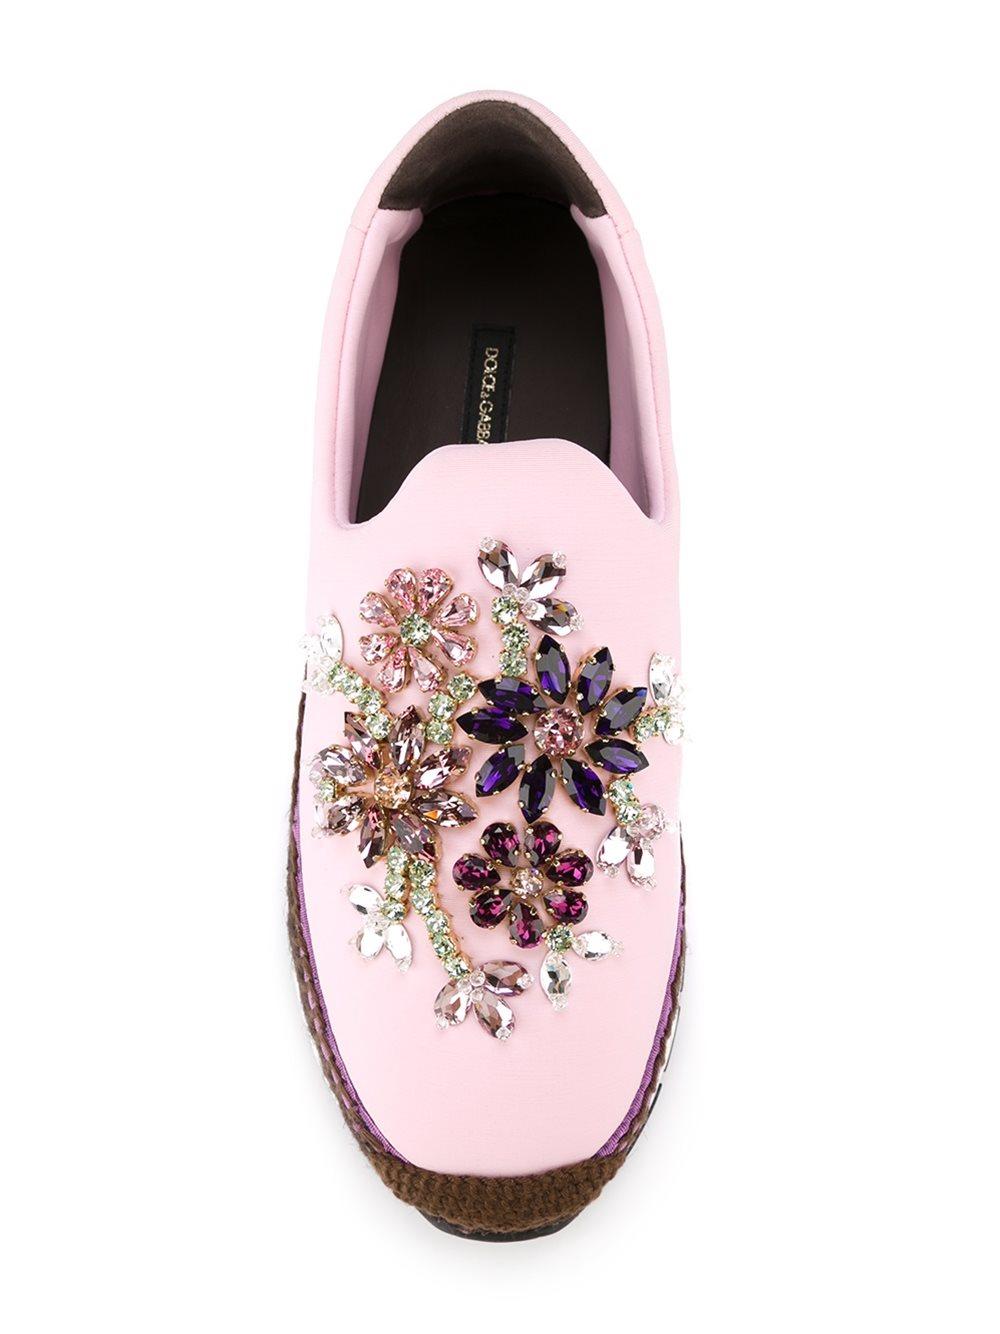 promo code c2e57 2a266 chaussure a lacet dolce gabbana